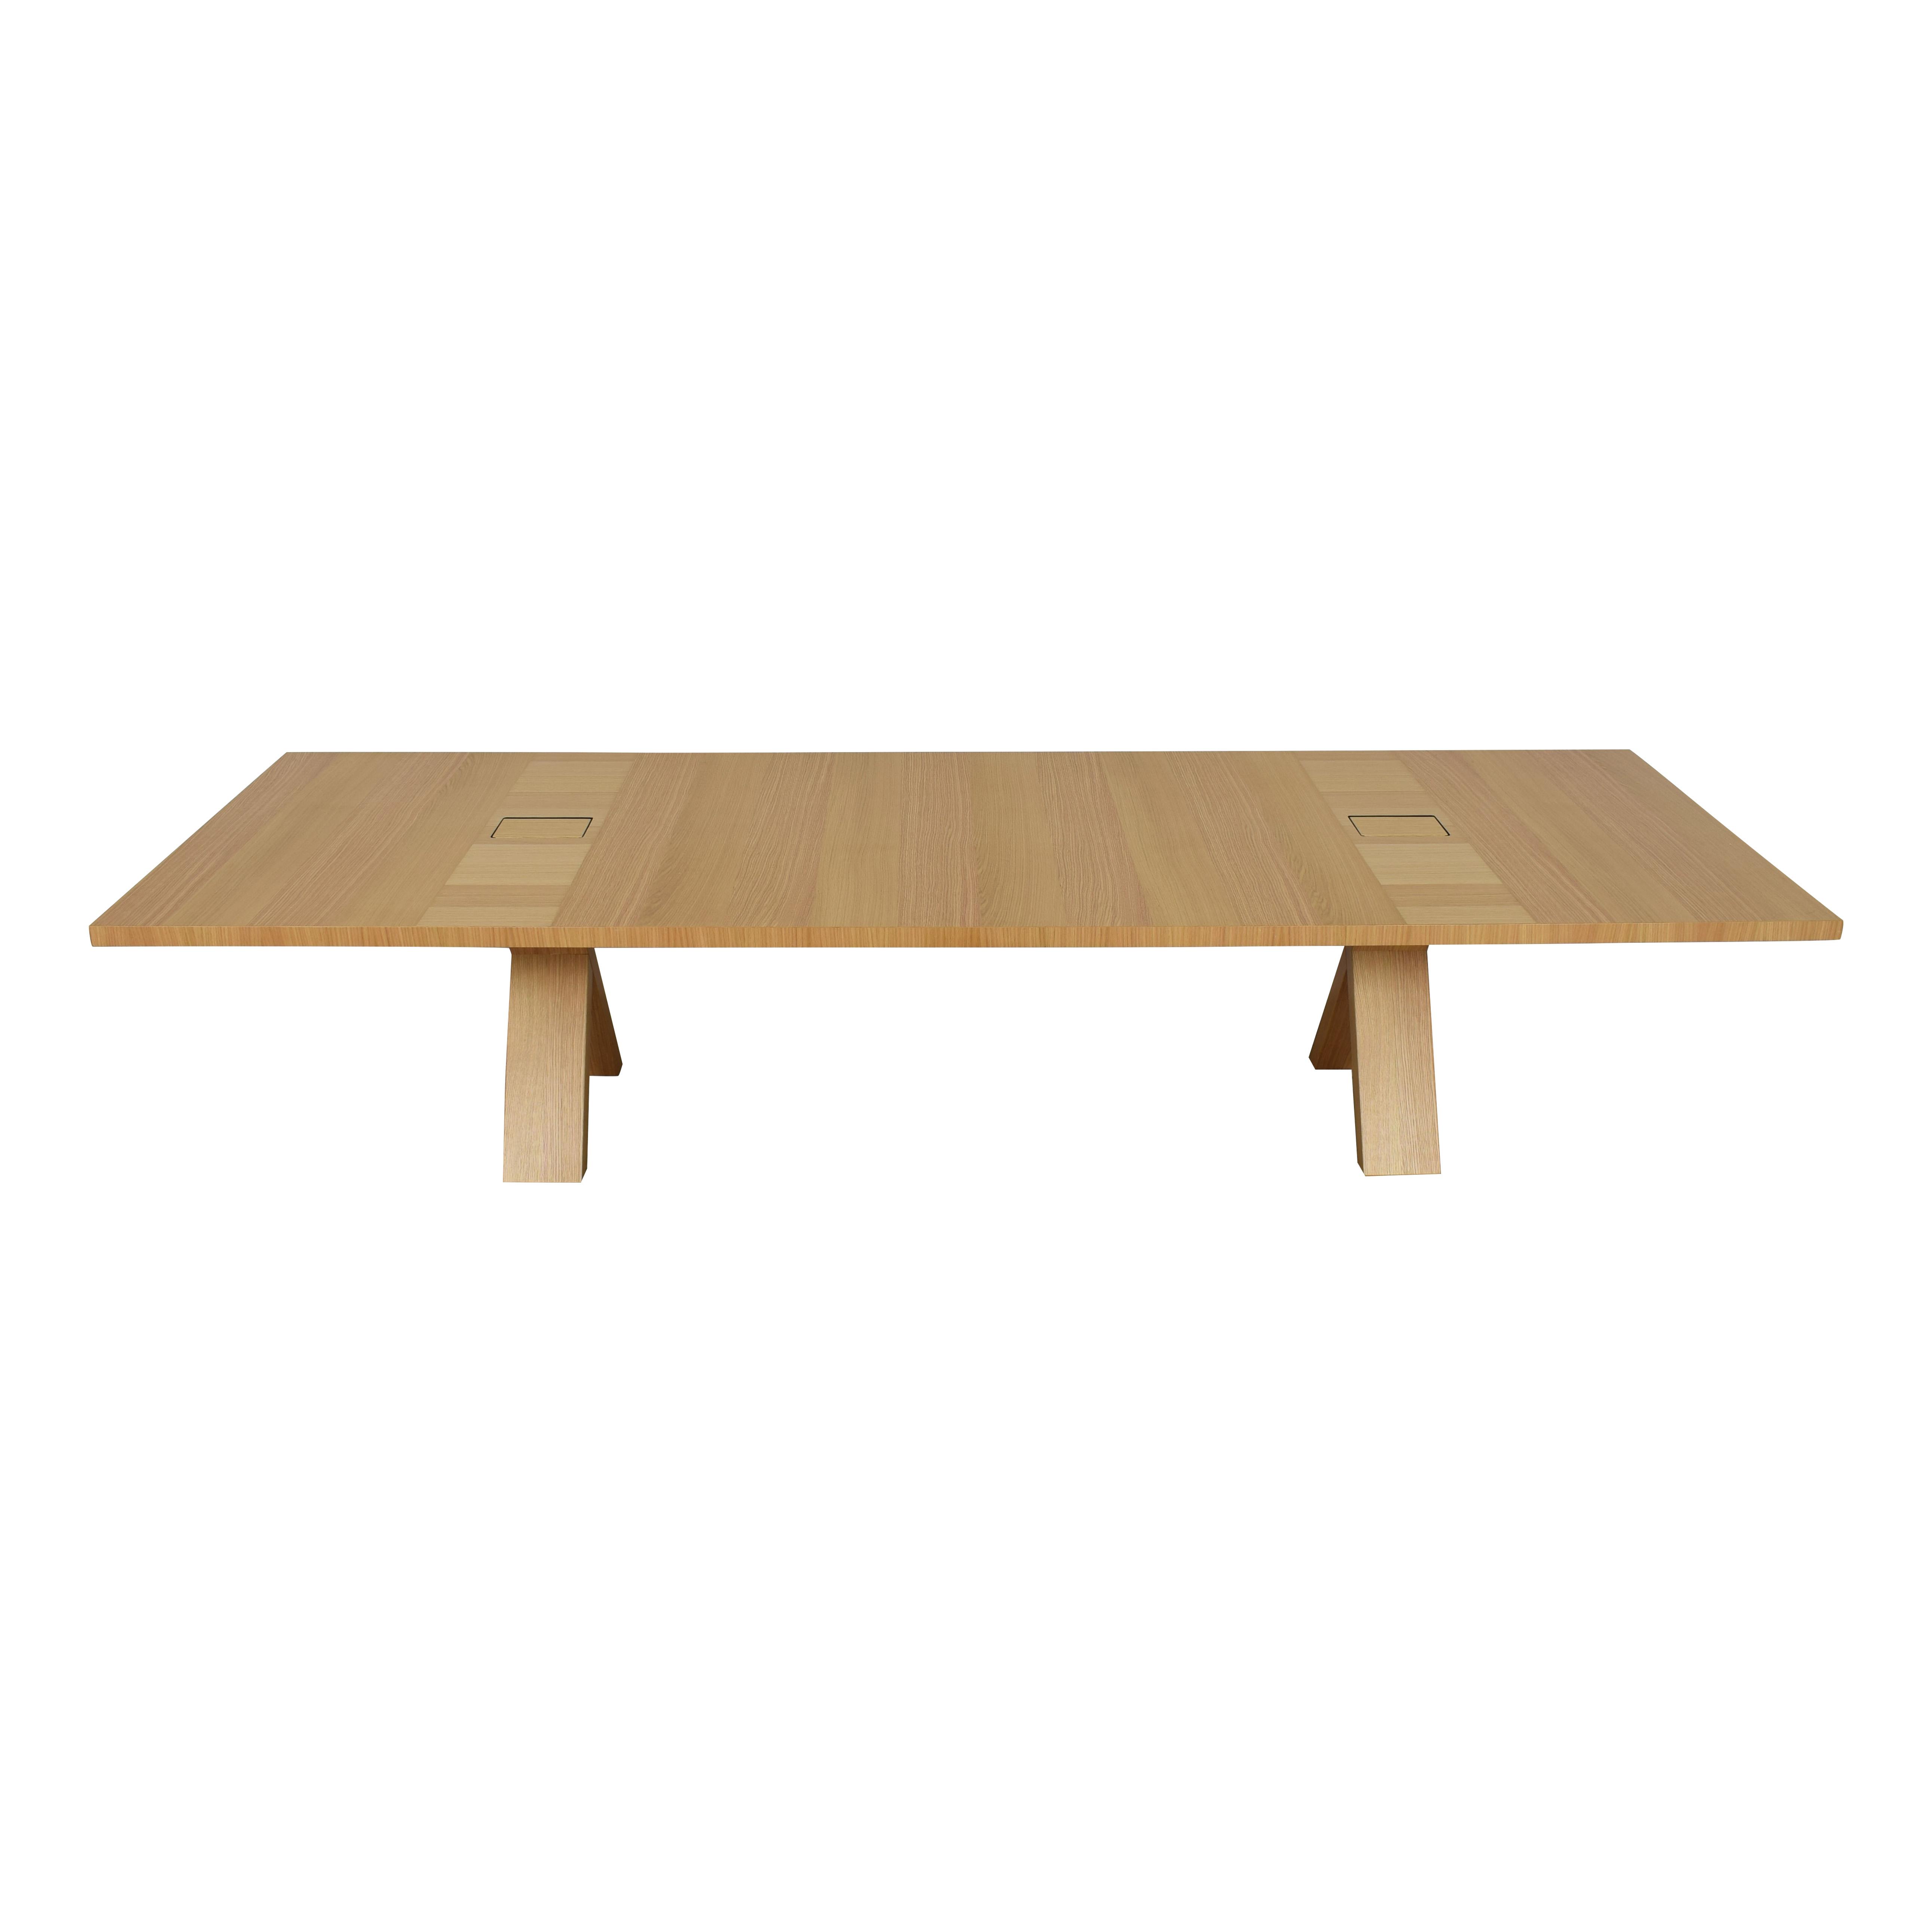 buy Koleksiyon Partita Dining Table Koleksiyon Tables